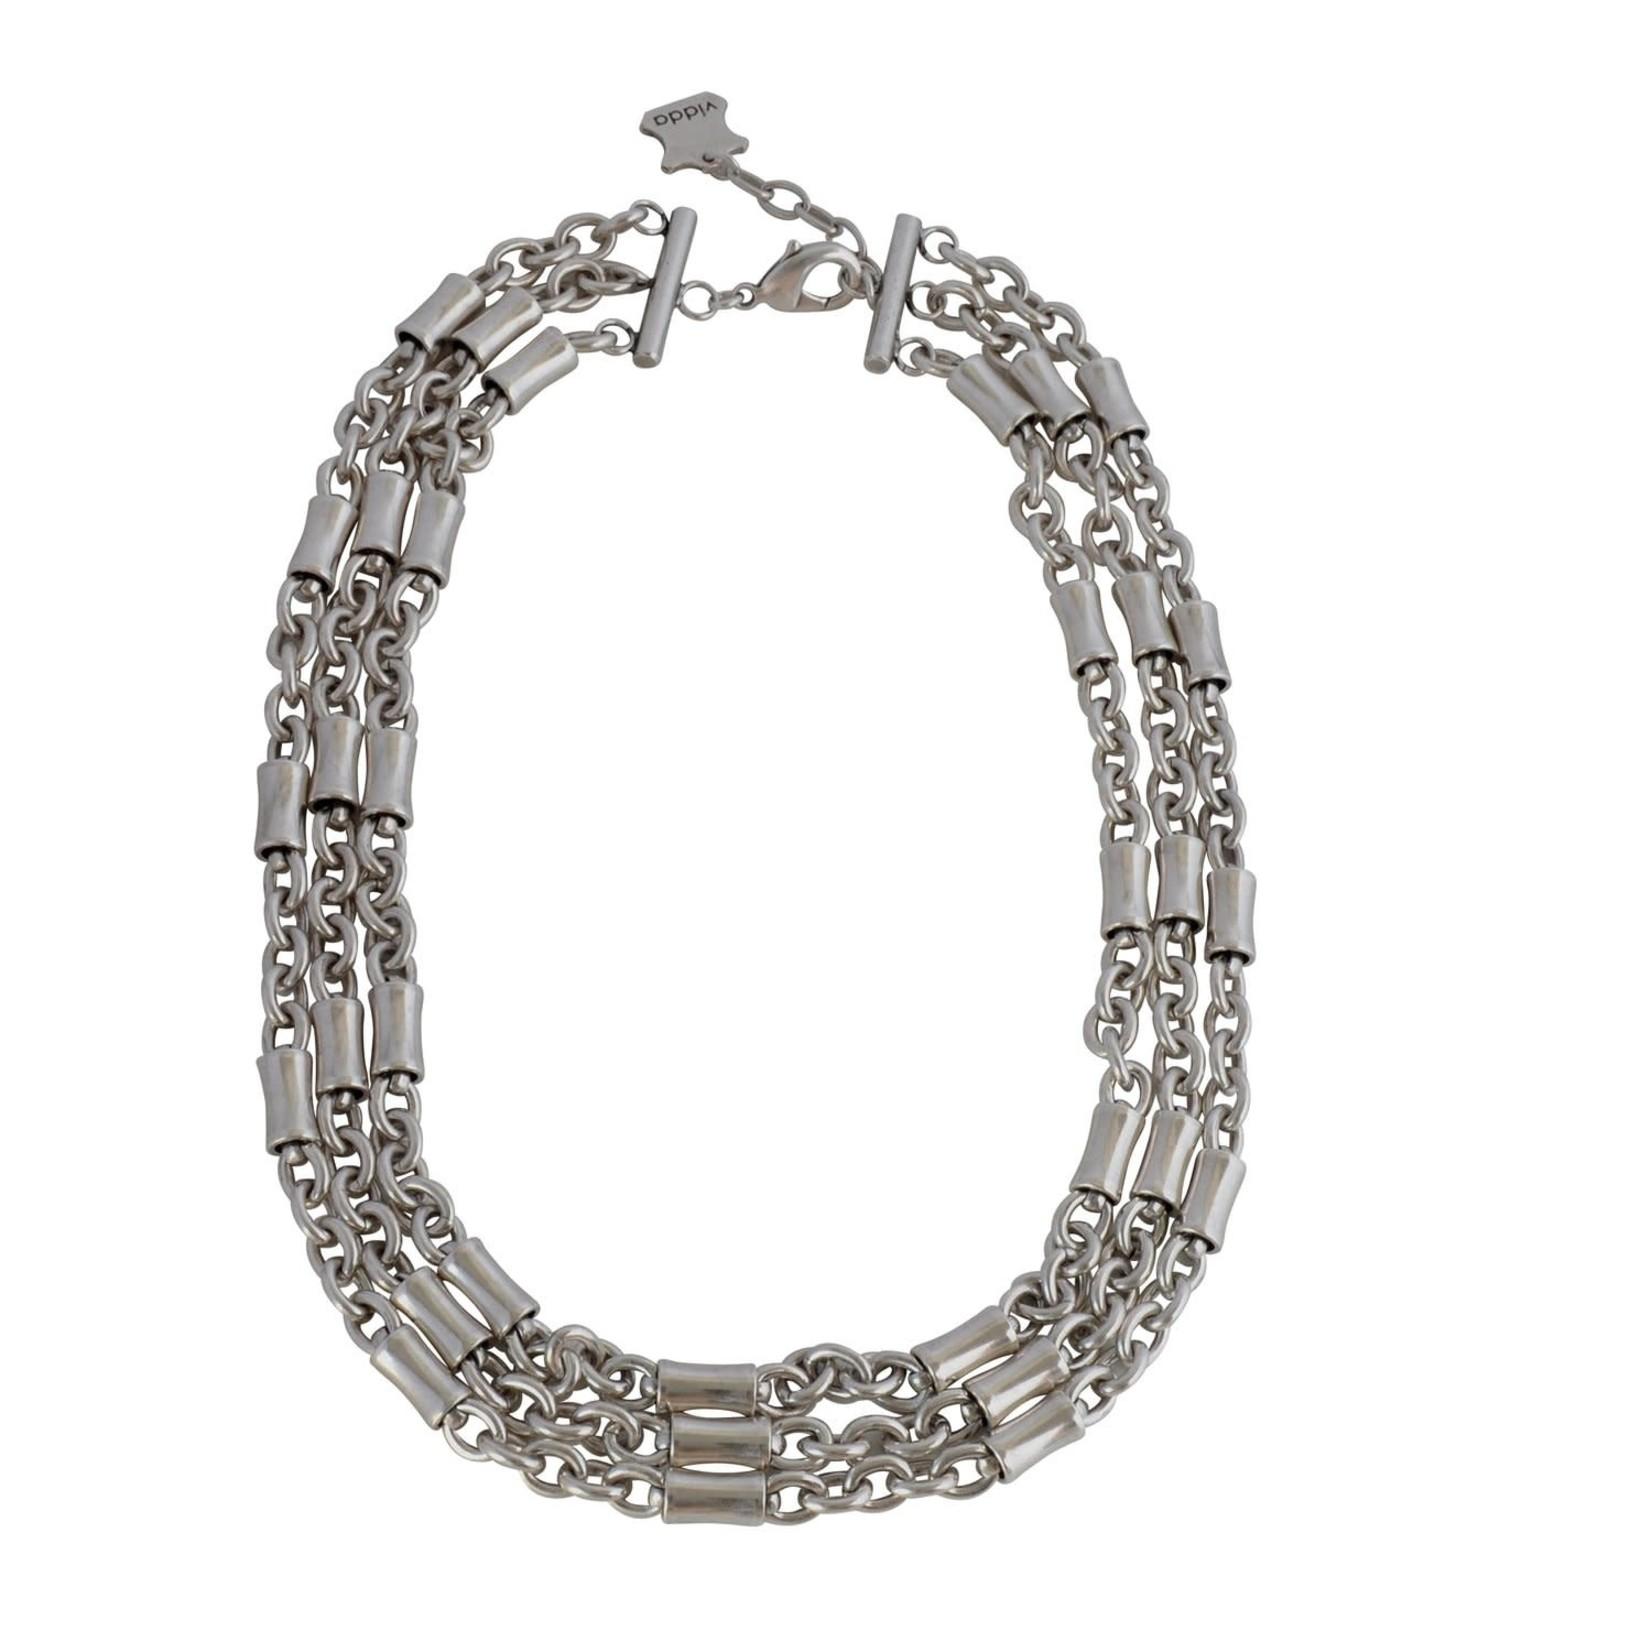 Necklace/Catwalk/3 Strand Short